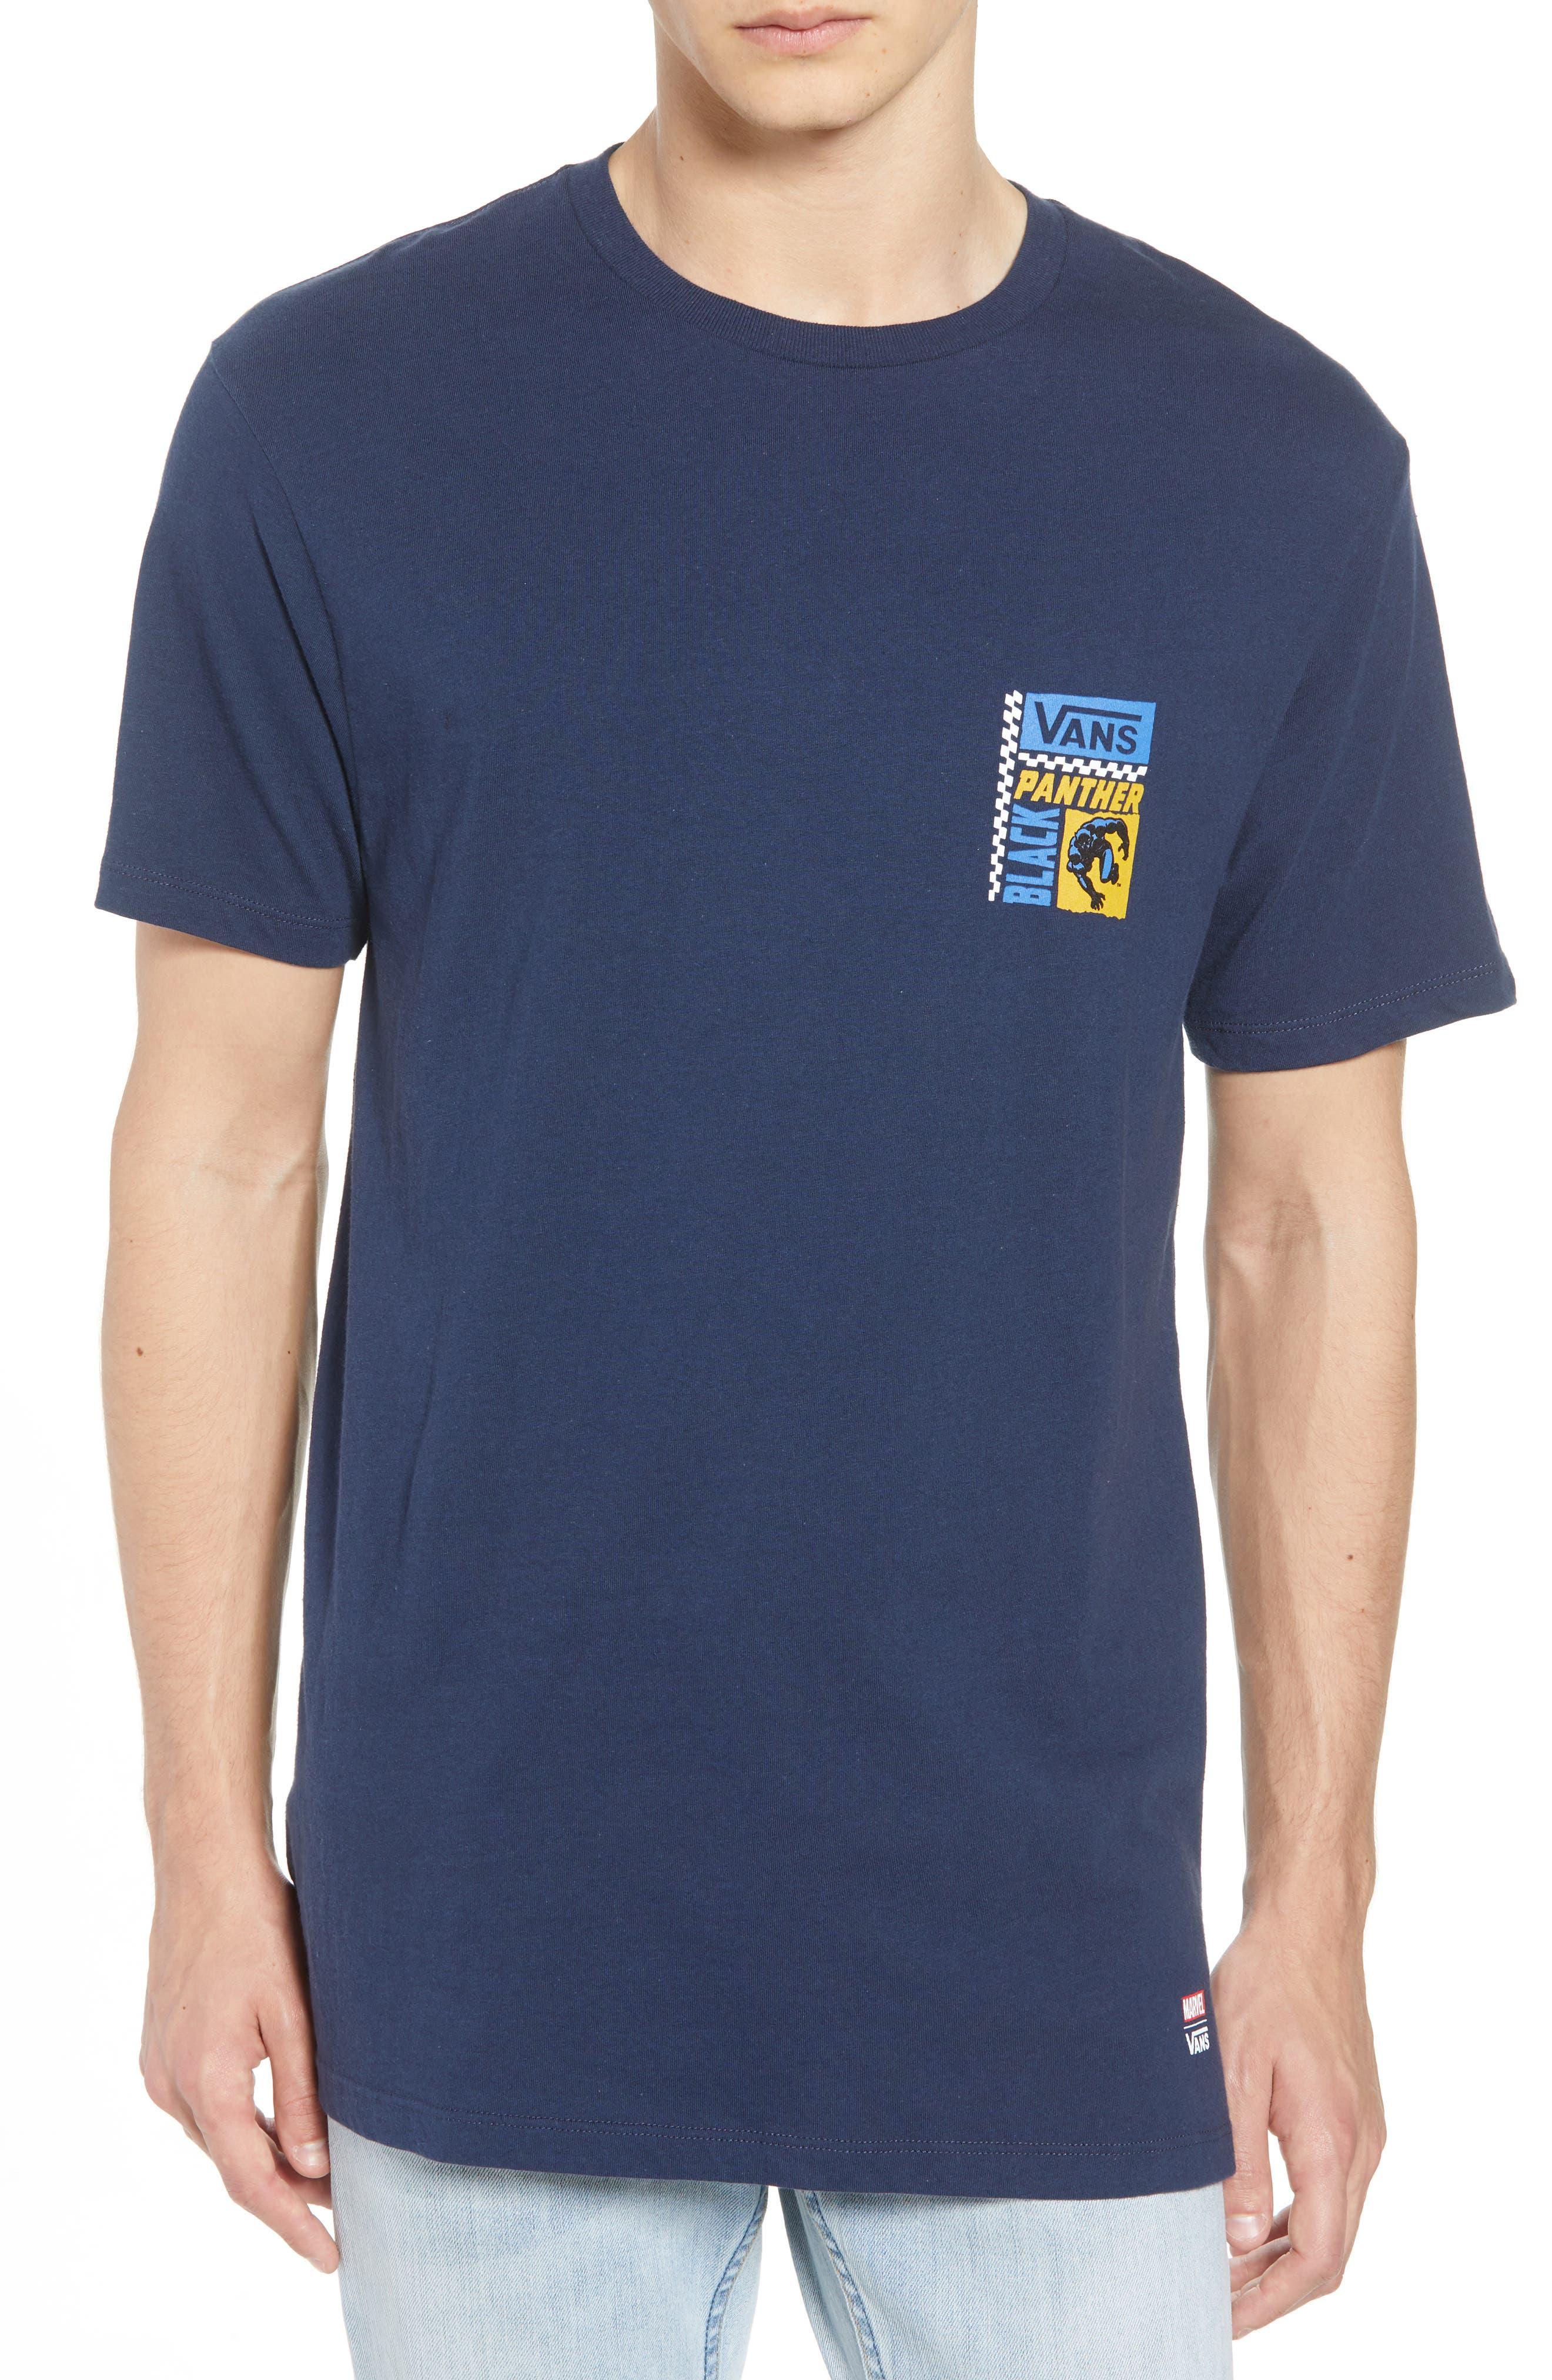 x Marvel<sup>®</sup> Black Panther T-Shirt,                         Main,                         color, Dress Blues